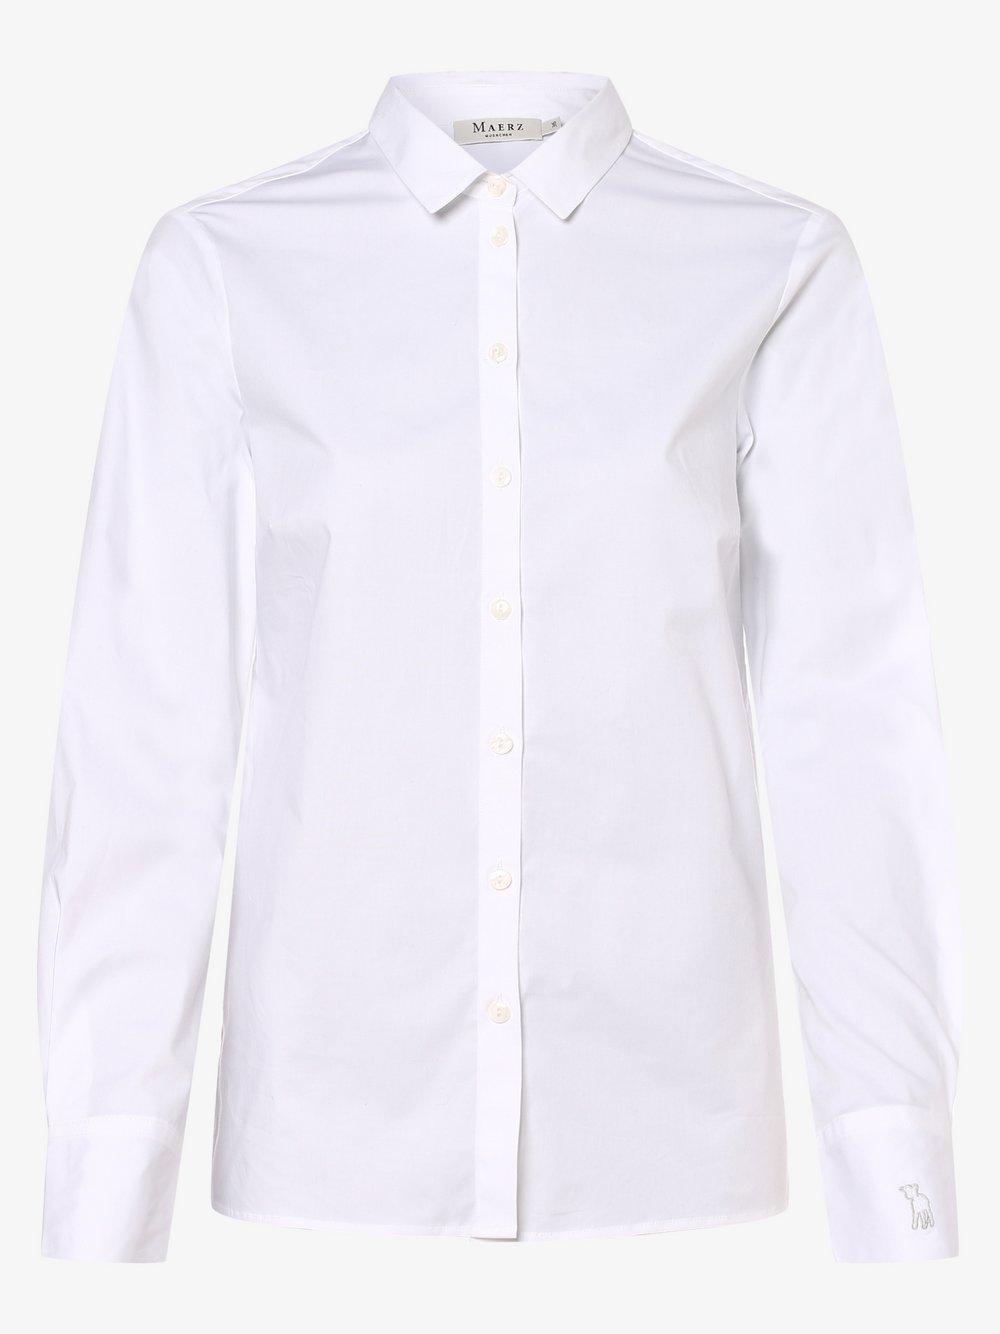 März - Bluzka damska, biały